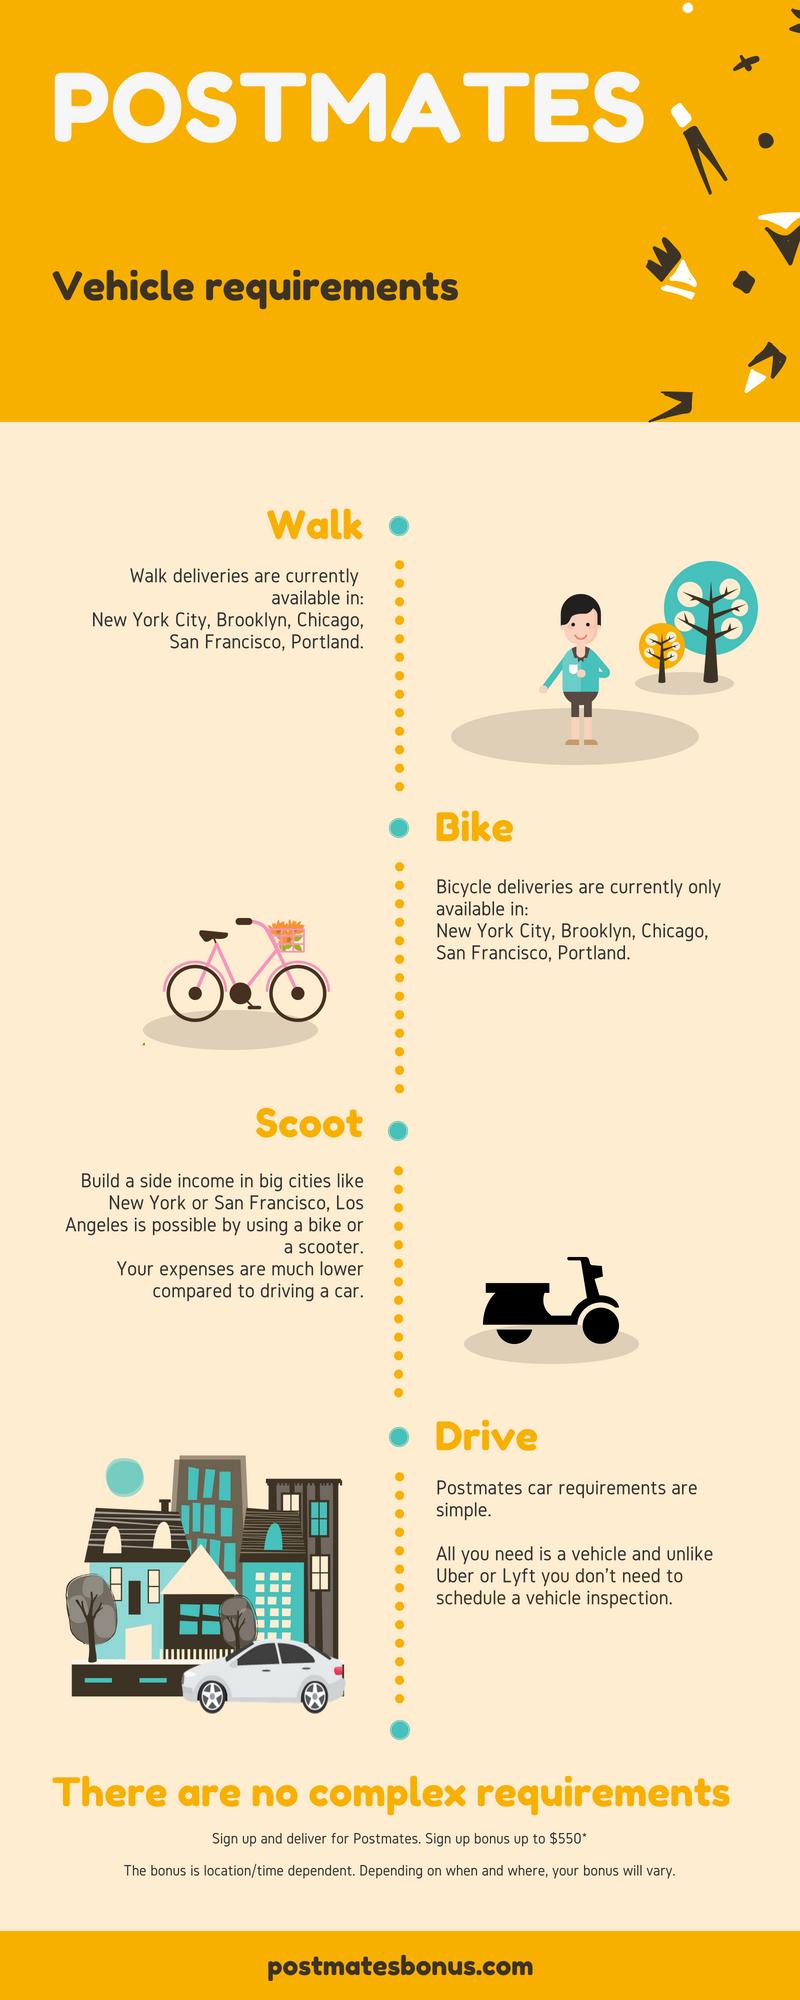 Postmates Vehicle Requirements Infographic Postmates Used Bikes Vehicles